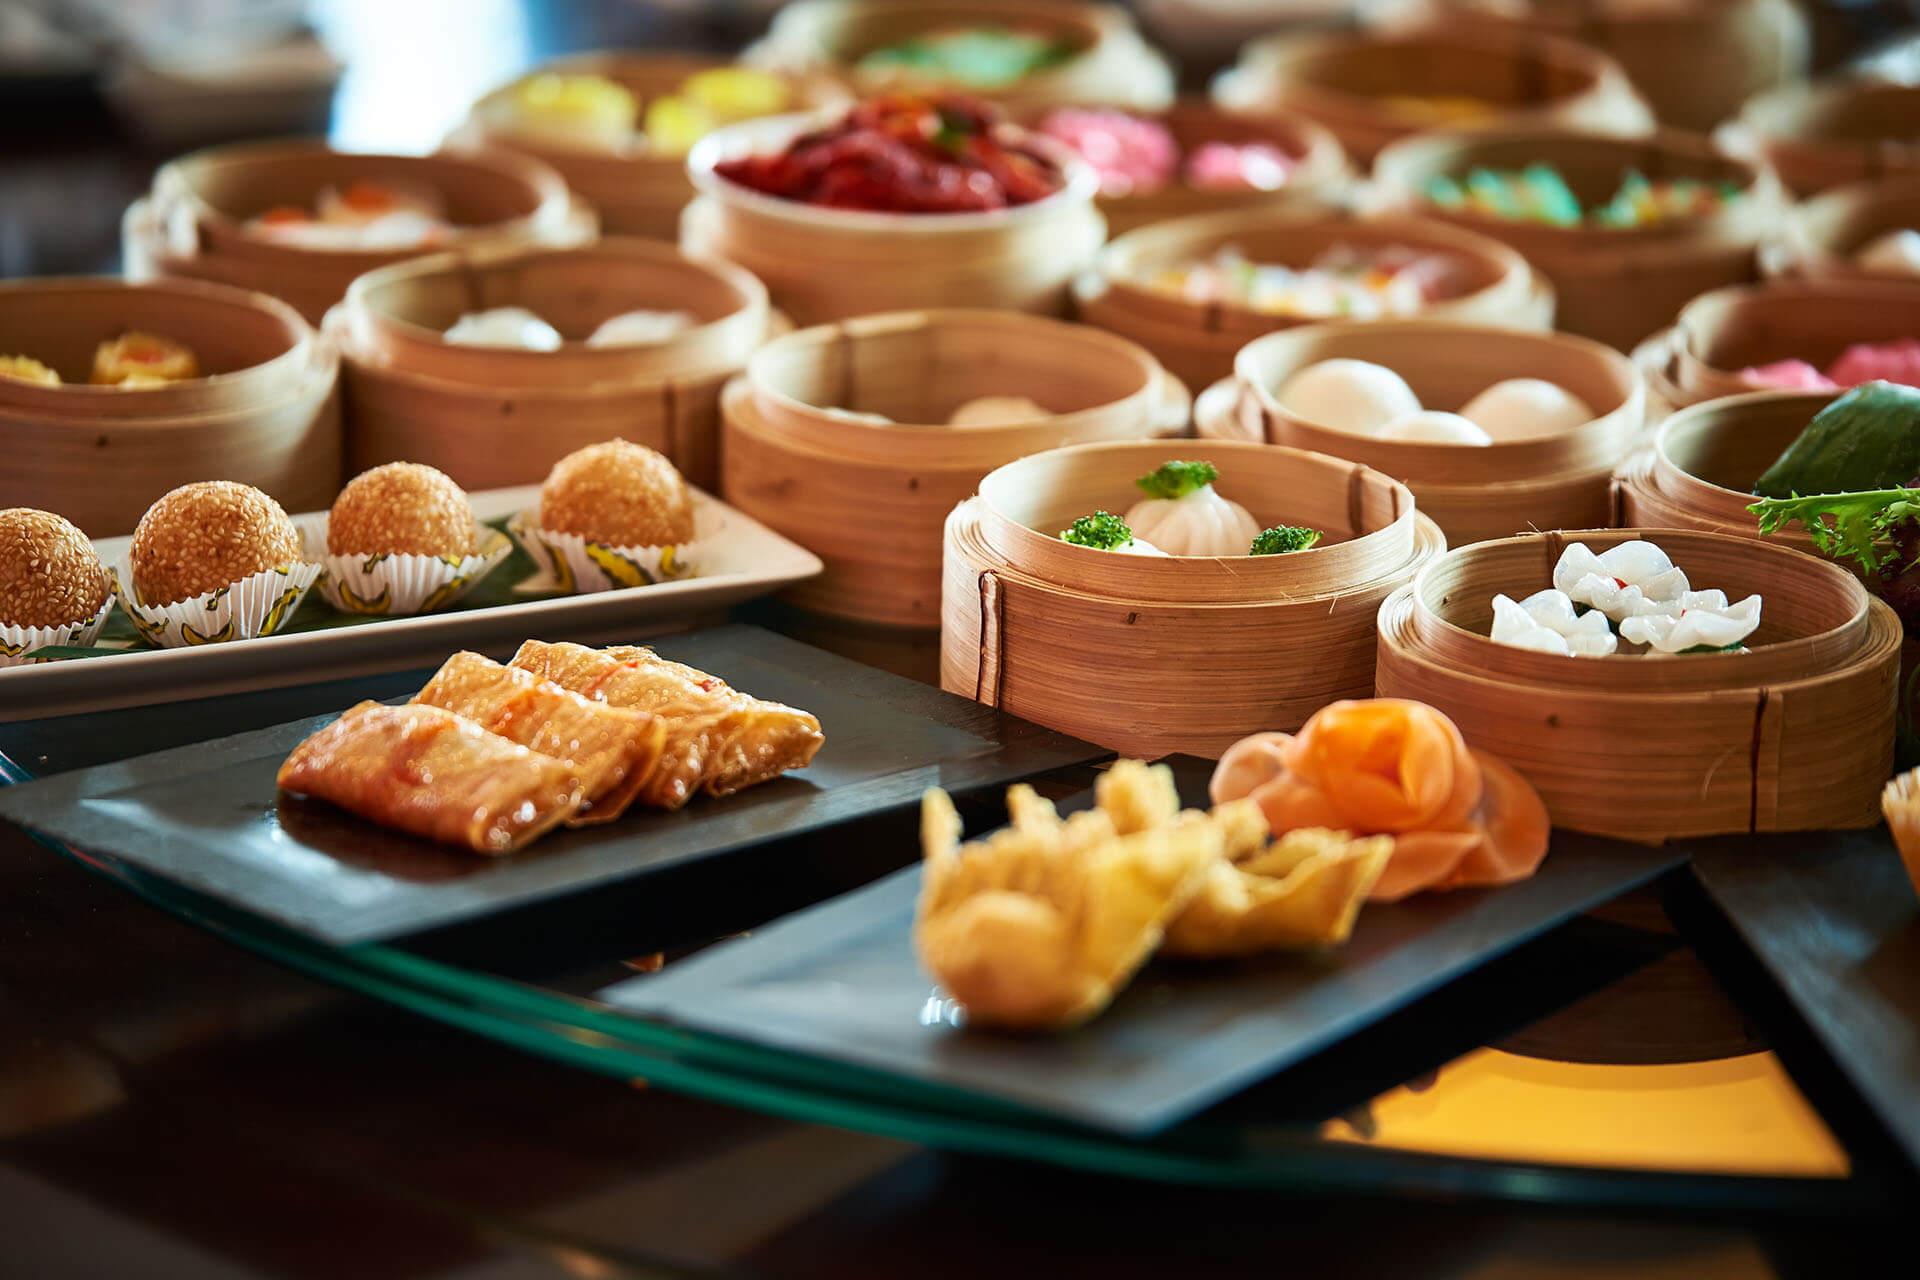 Tiec Buffet Trung Hoa Mung Ngay Quoc Te Phu Nu Tai Grand Mercure Danang 02